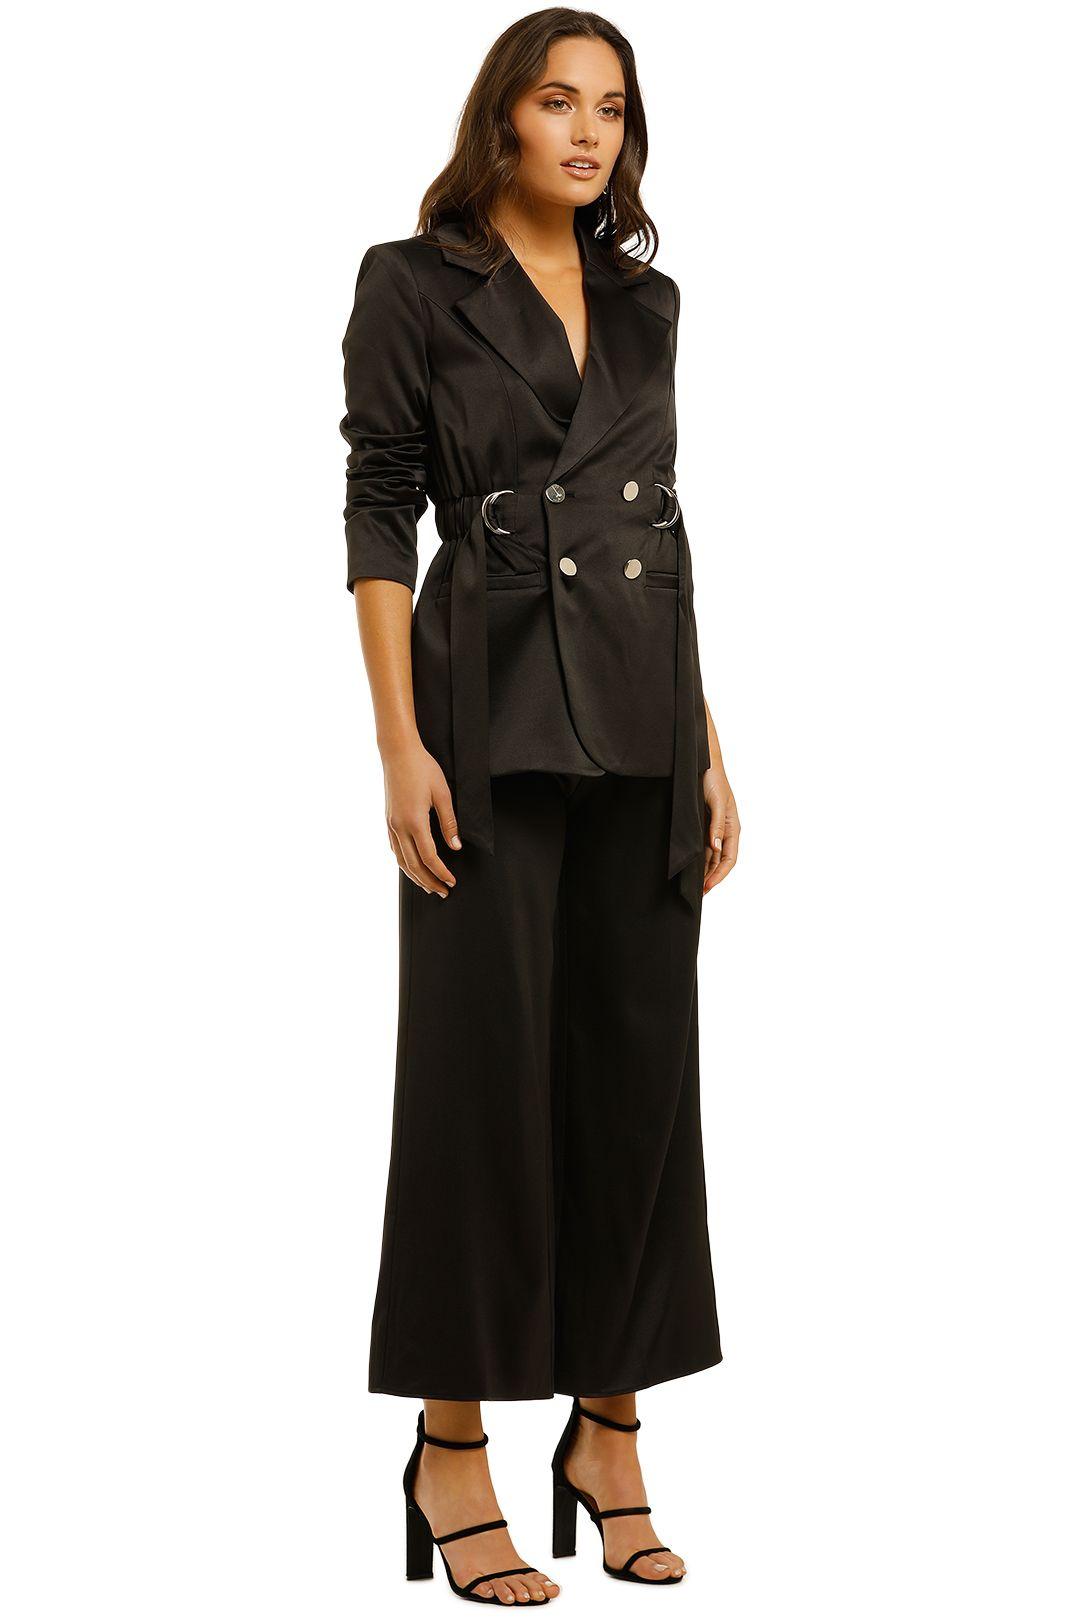 Elliatt-Shimmer-Blazer-and-Pant-Set-Black-Side